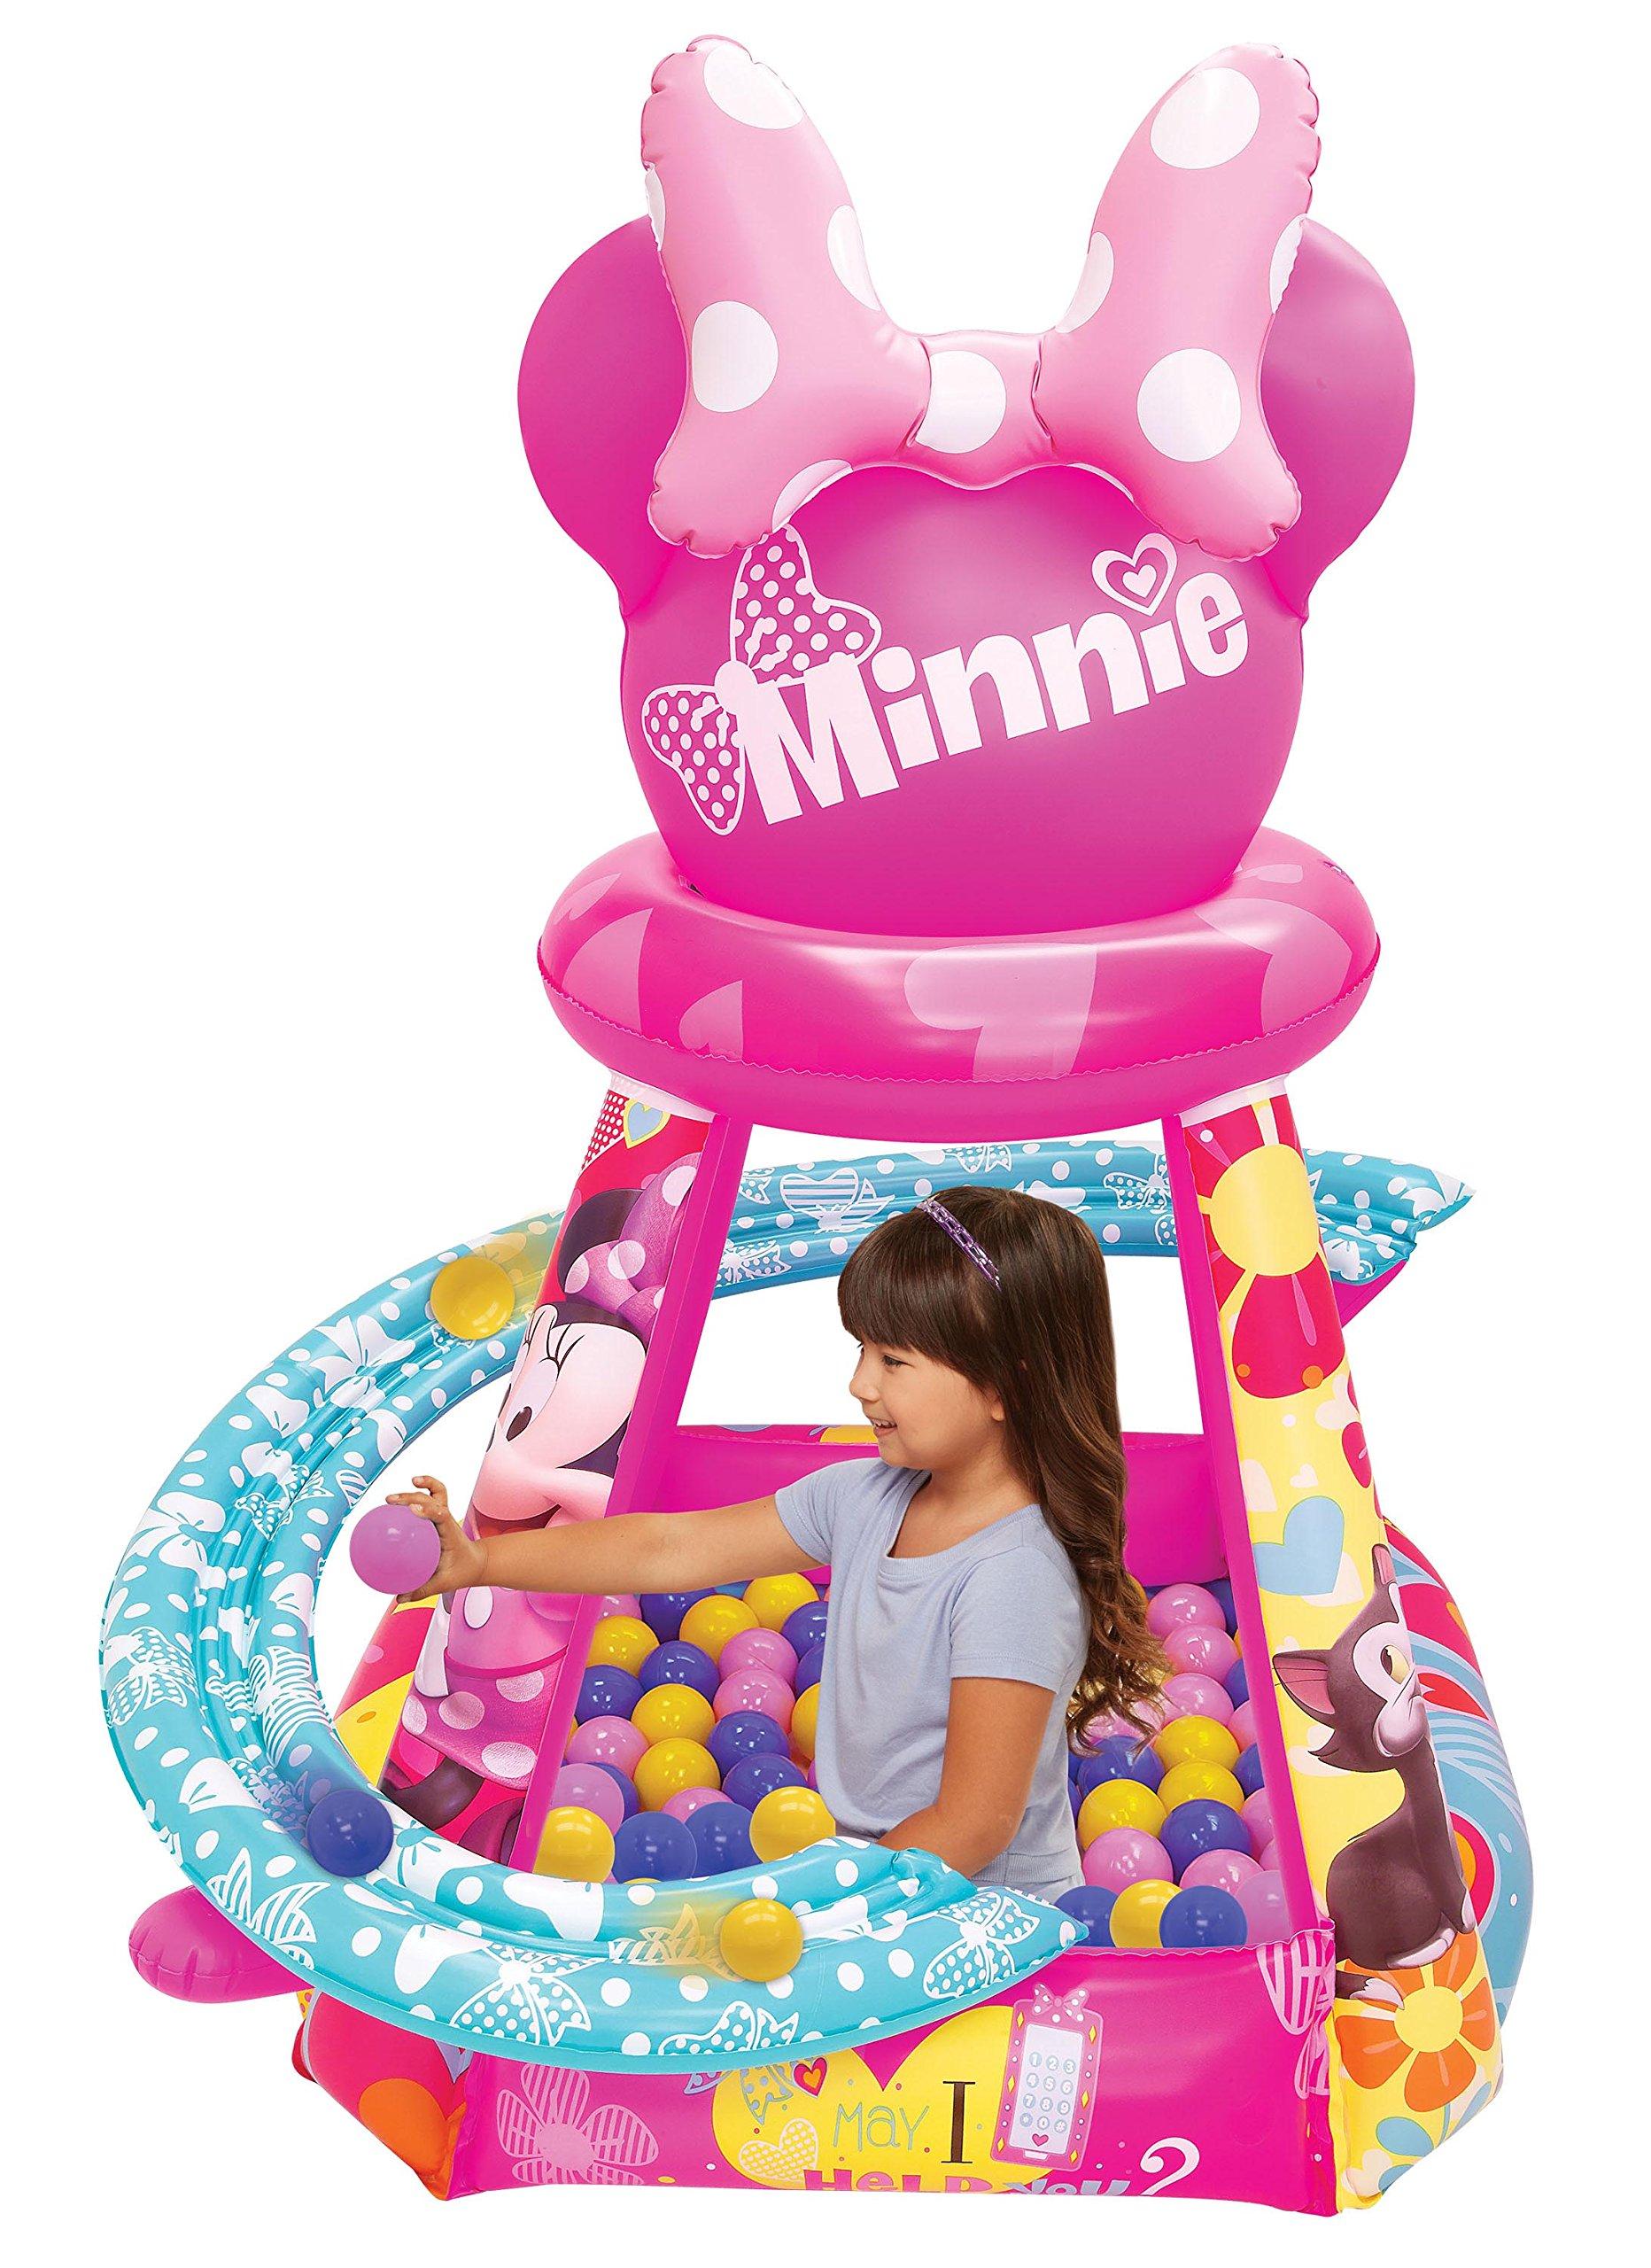 Minnie Mouse Big Heart & Bows Ball Pit, 1 Inflatable & 50 Sof-Flex Balls, Pink, 43'' W x 43'' D x 38'' H